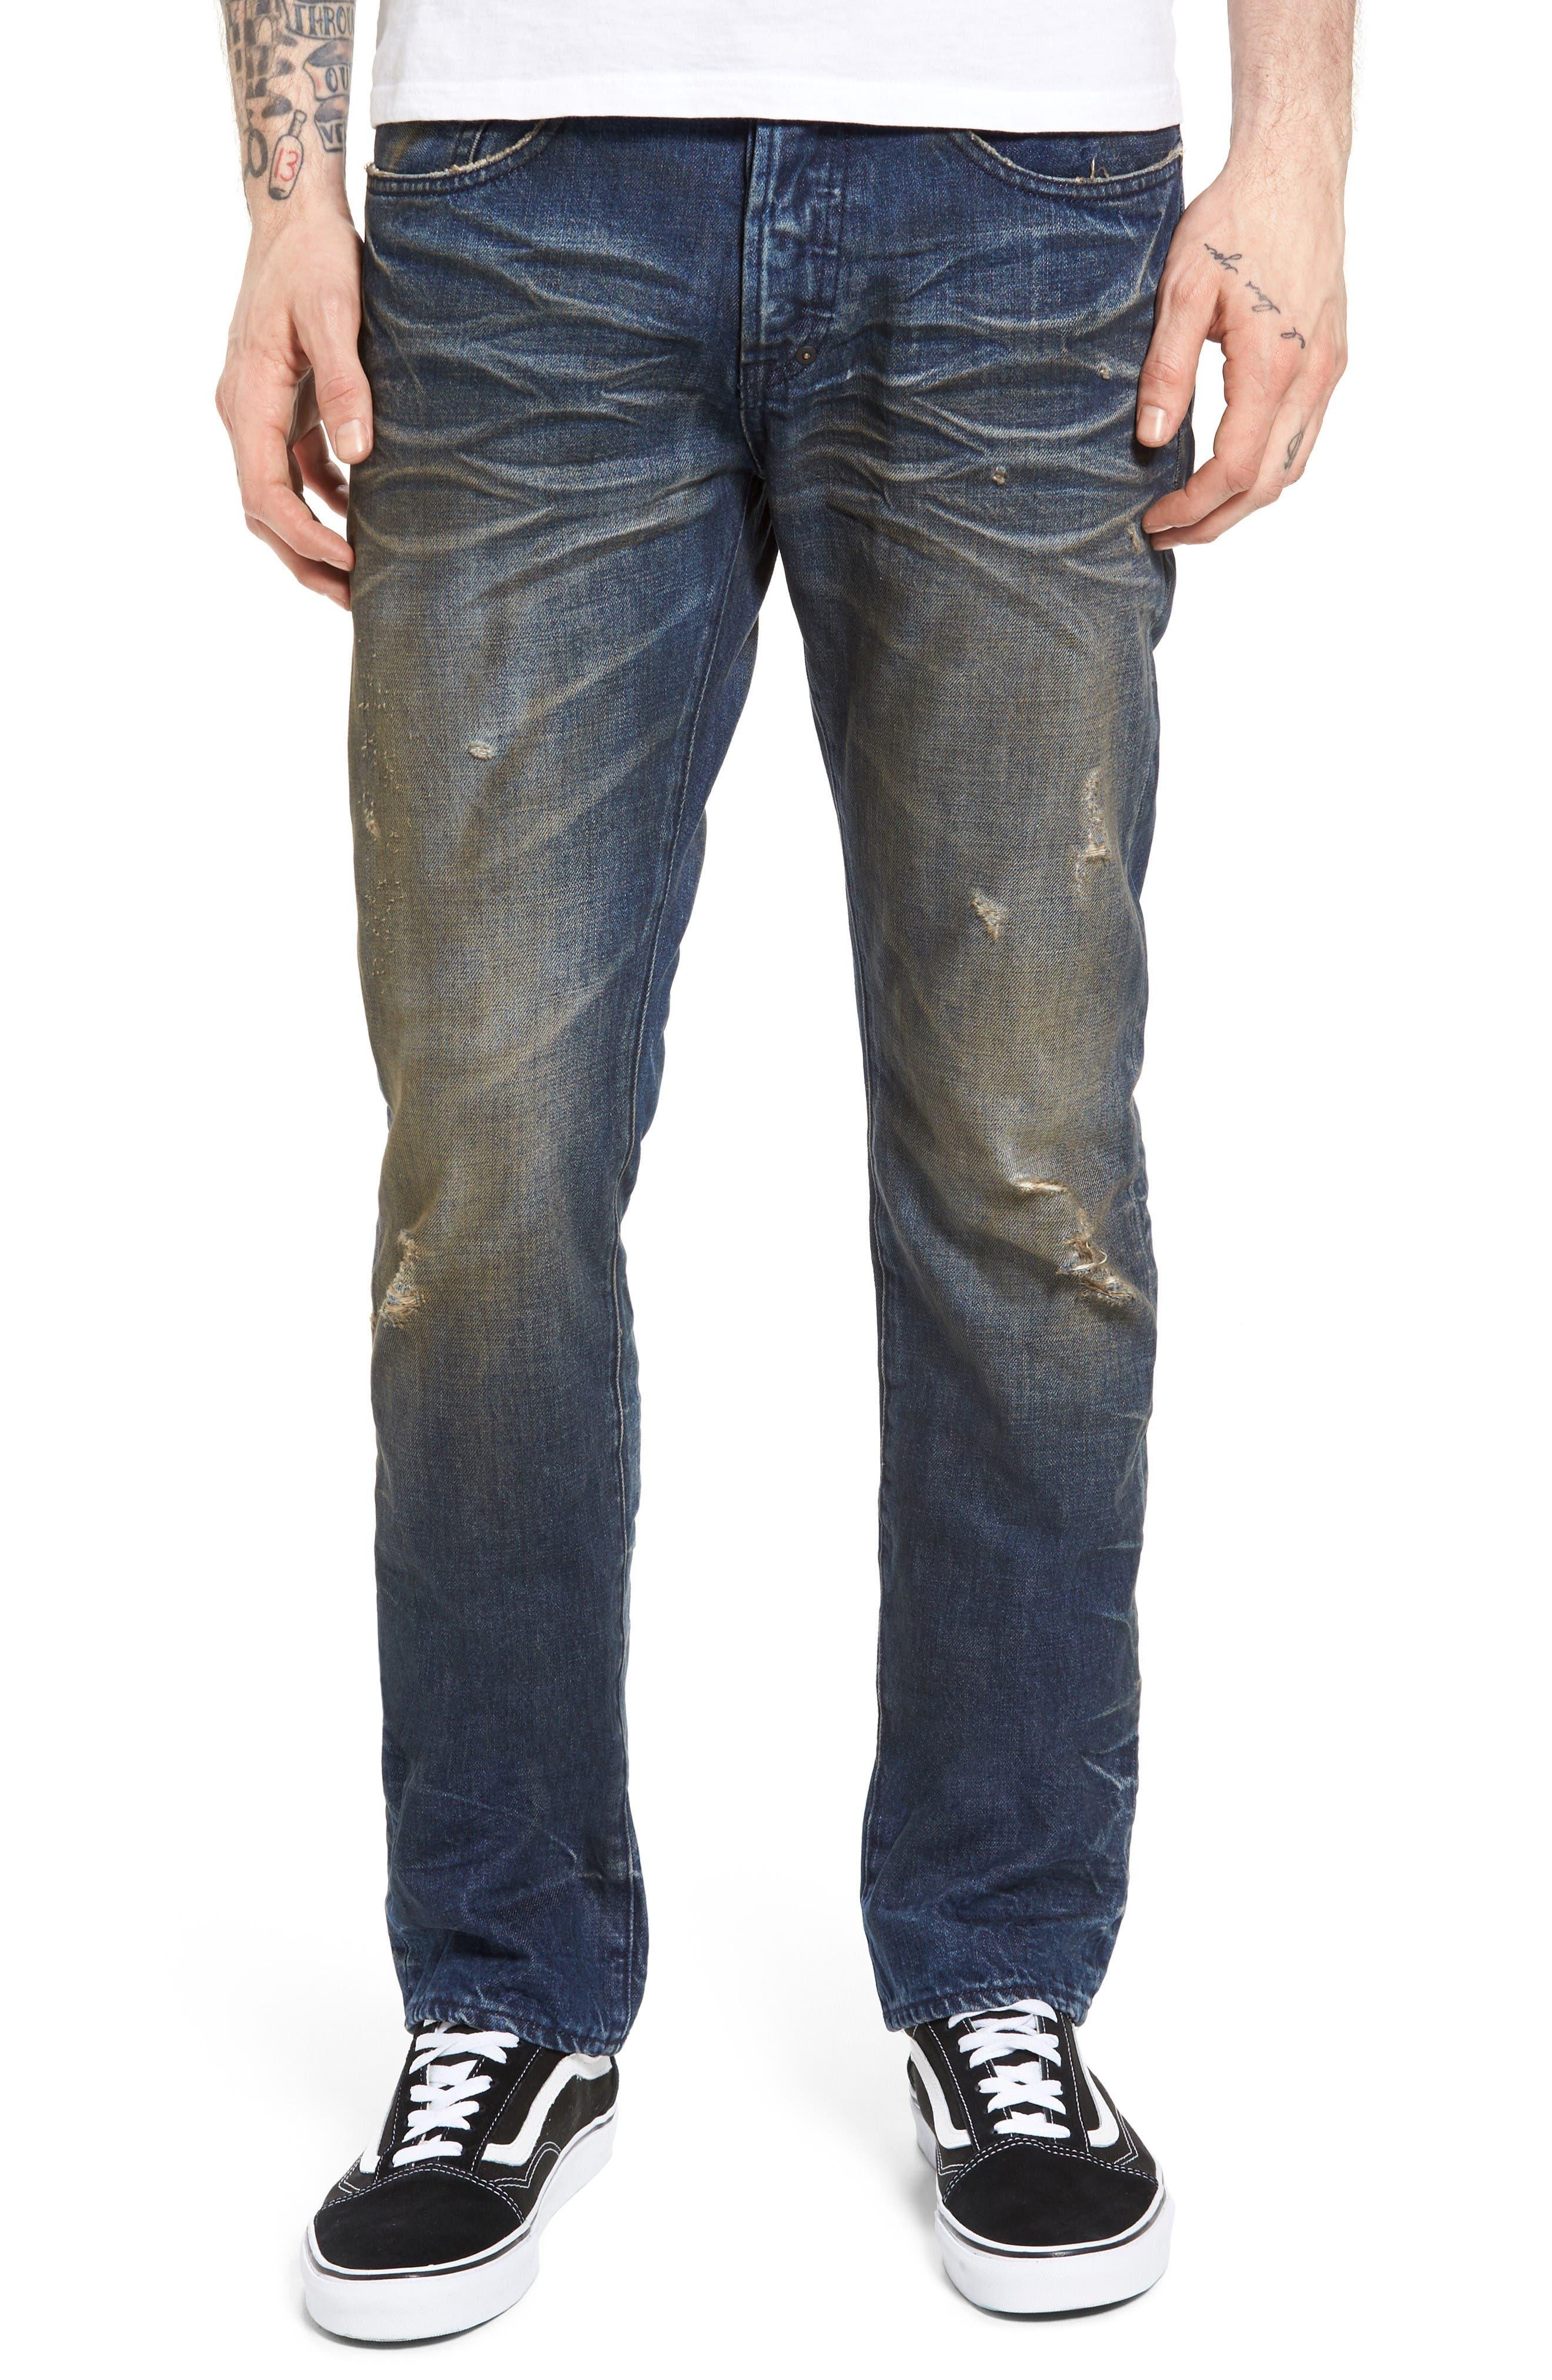 Demon Slim Straight Leg Jeans,                         Main,                         color, Indigo Blue